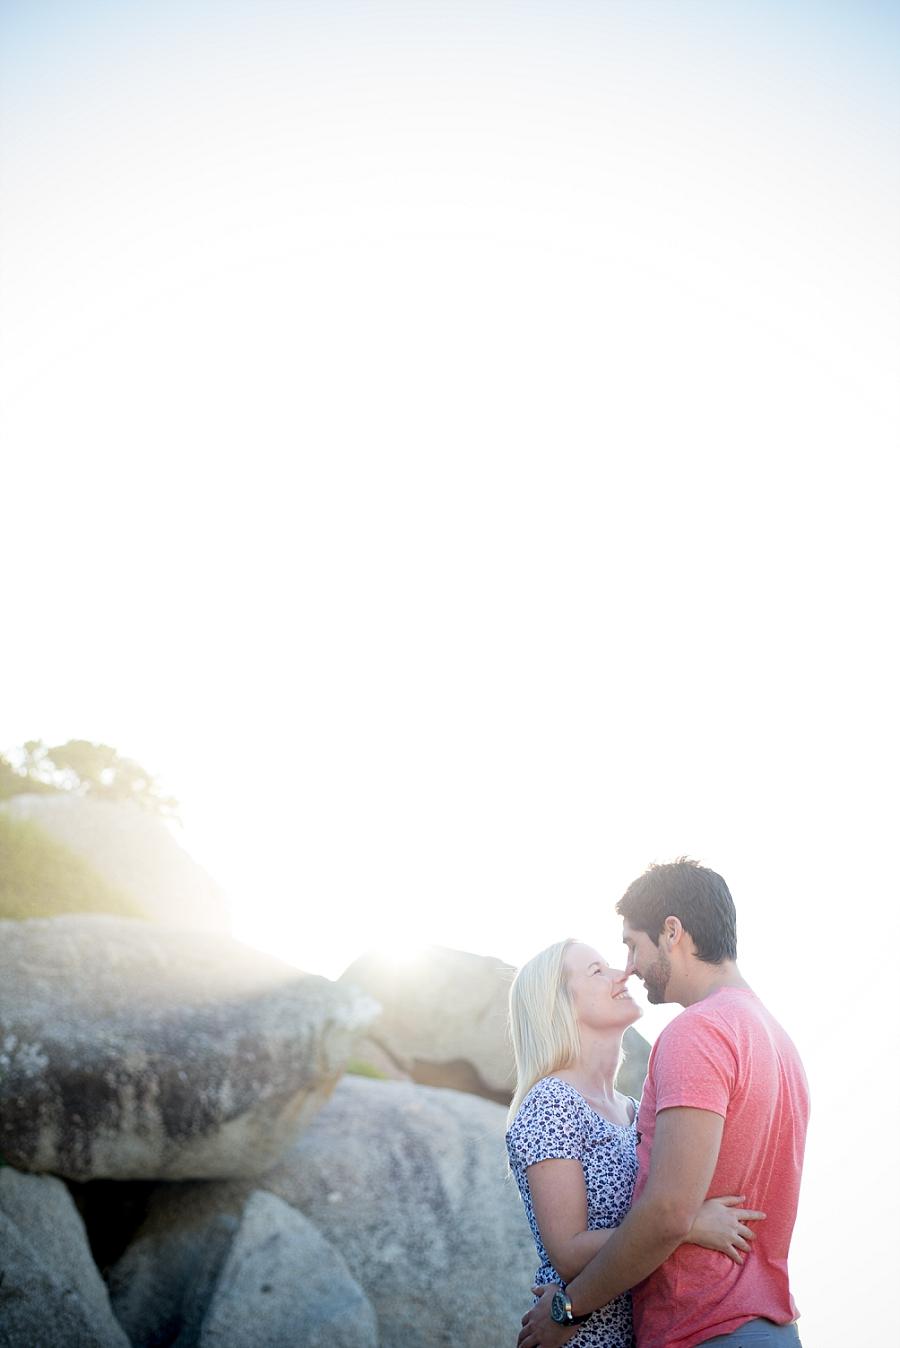 Darren Bester Photography - Cape Town - Chantelle and James_0009.jpg